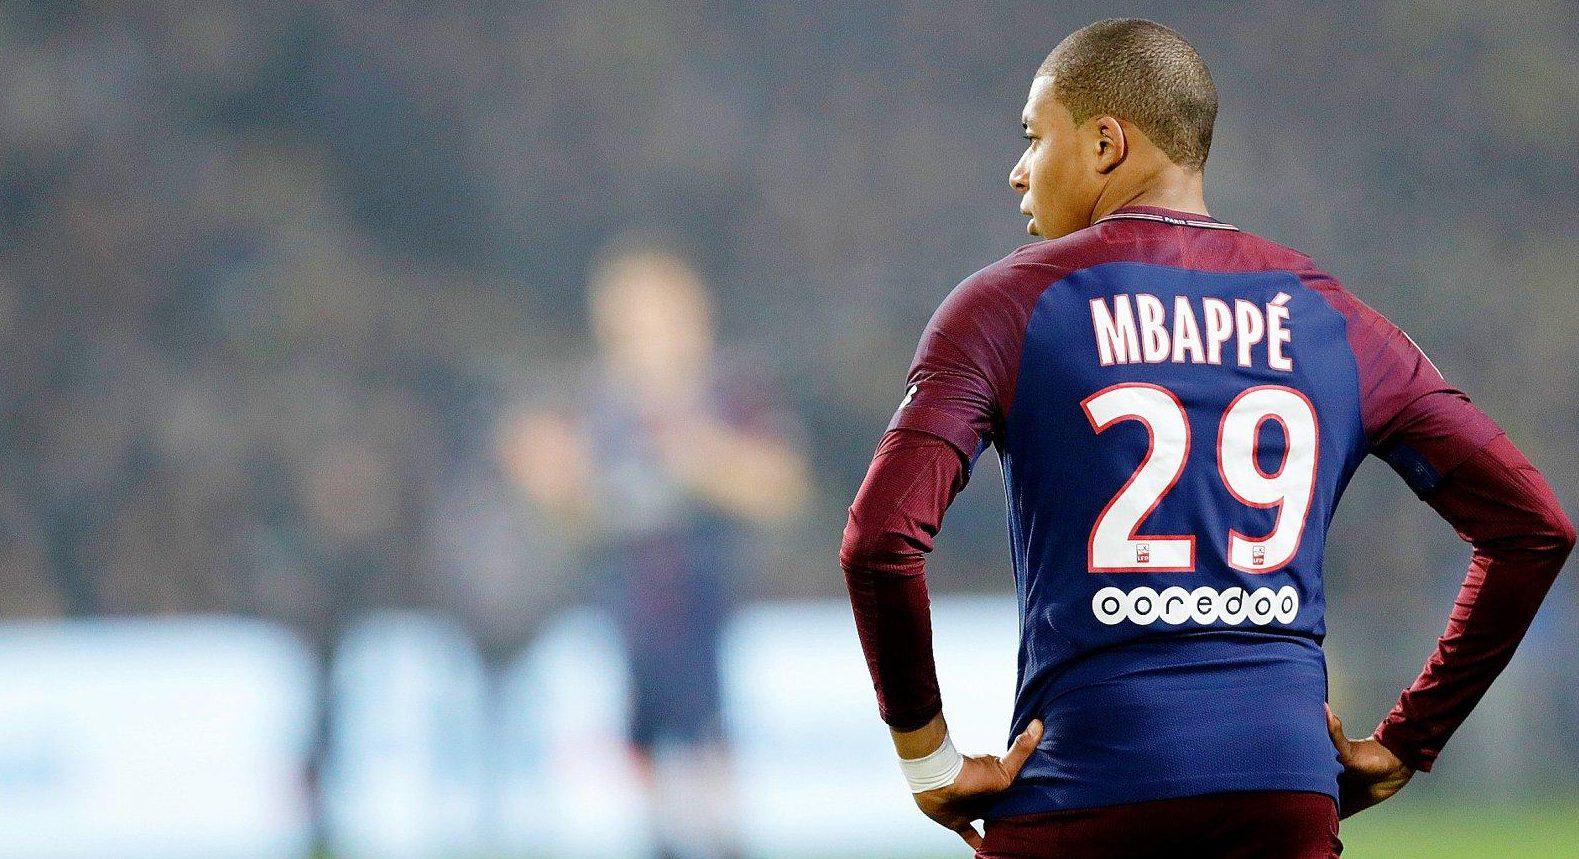 Rio Ferdinand espère que Manchester United va recruter Mbappé